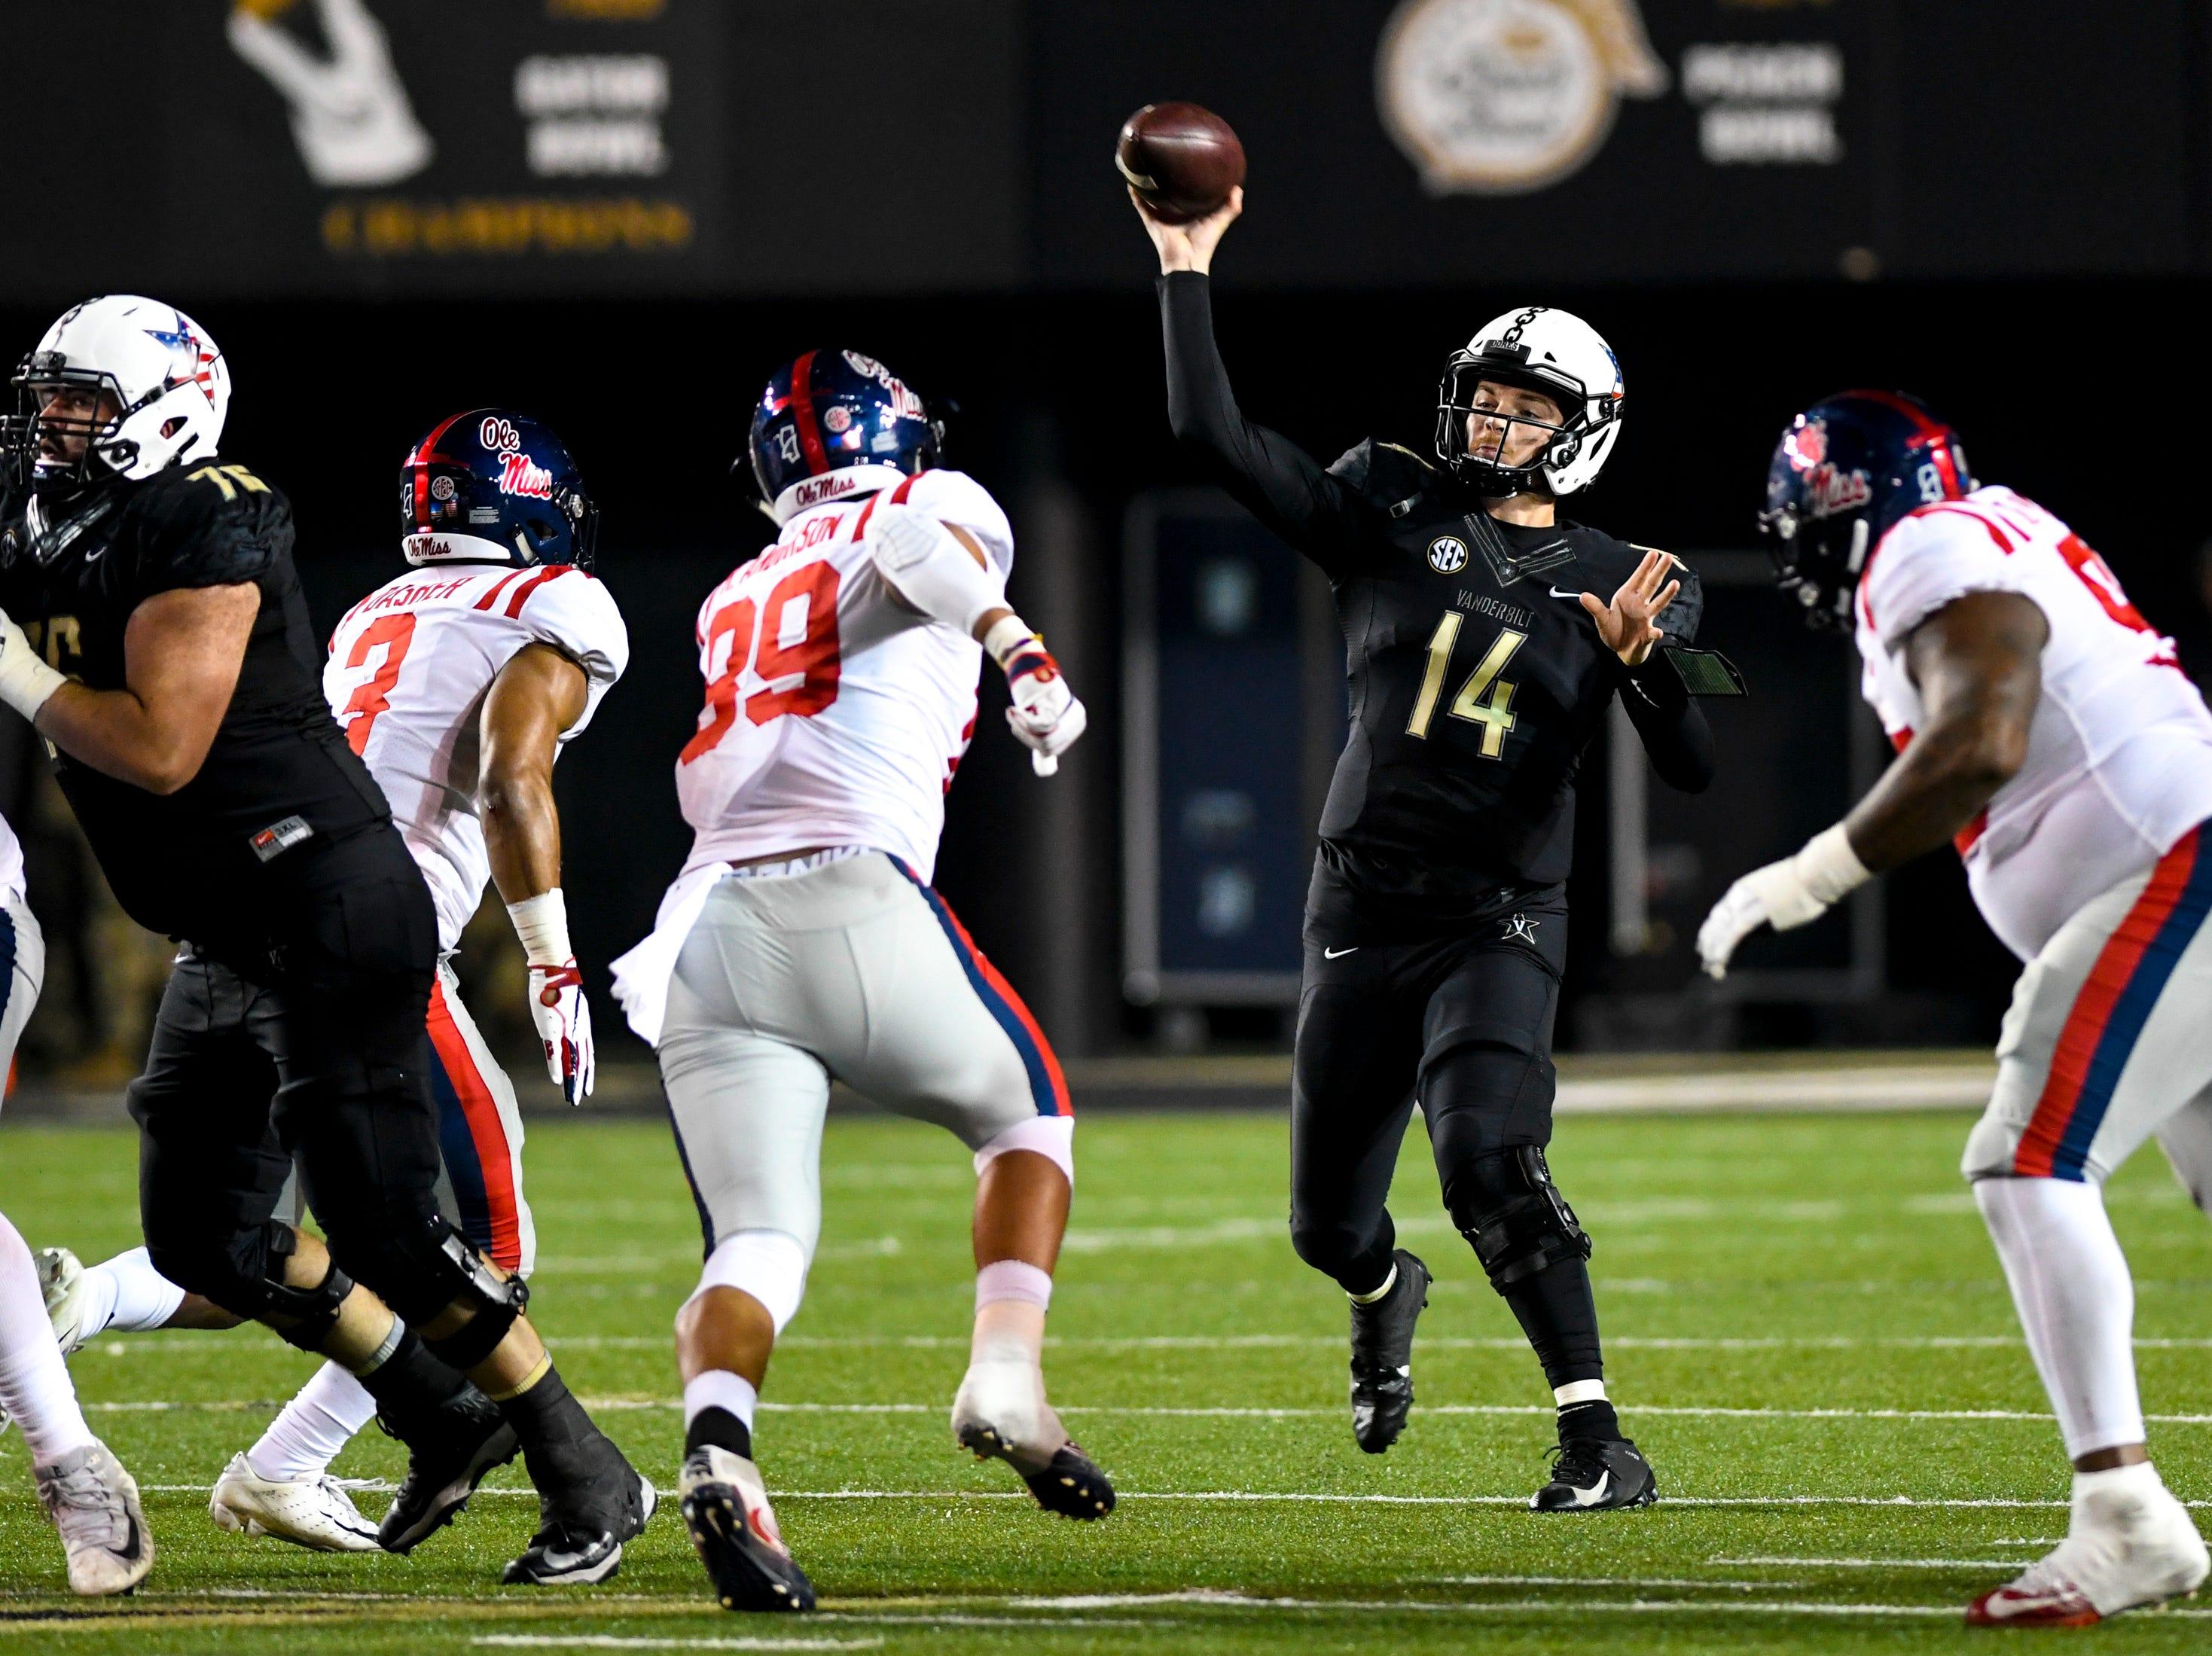 Vanderbilt quarterback Kyle Shurmur (14) passes during Vanderbilt's game against Ole Miss at Vanderbilt Stadium in Nashville on Saturday, Nov. 17, 2018.